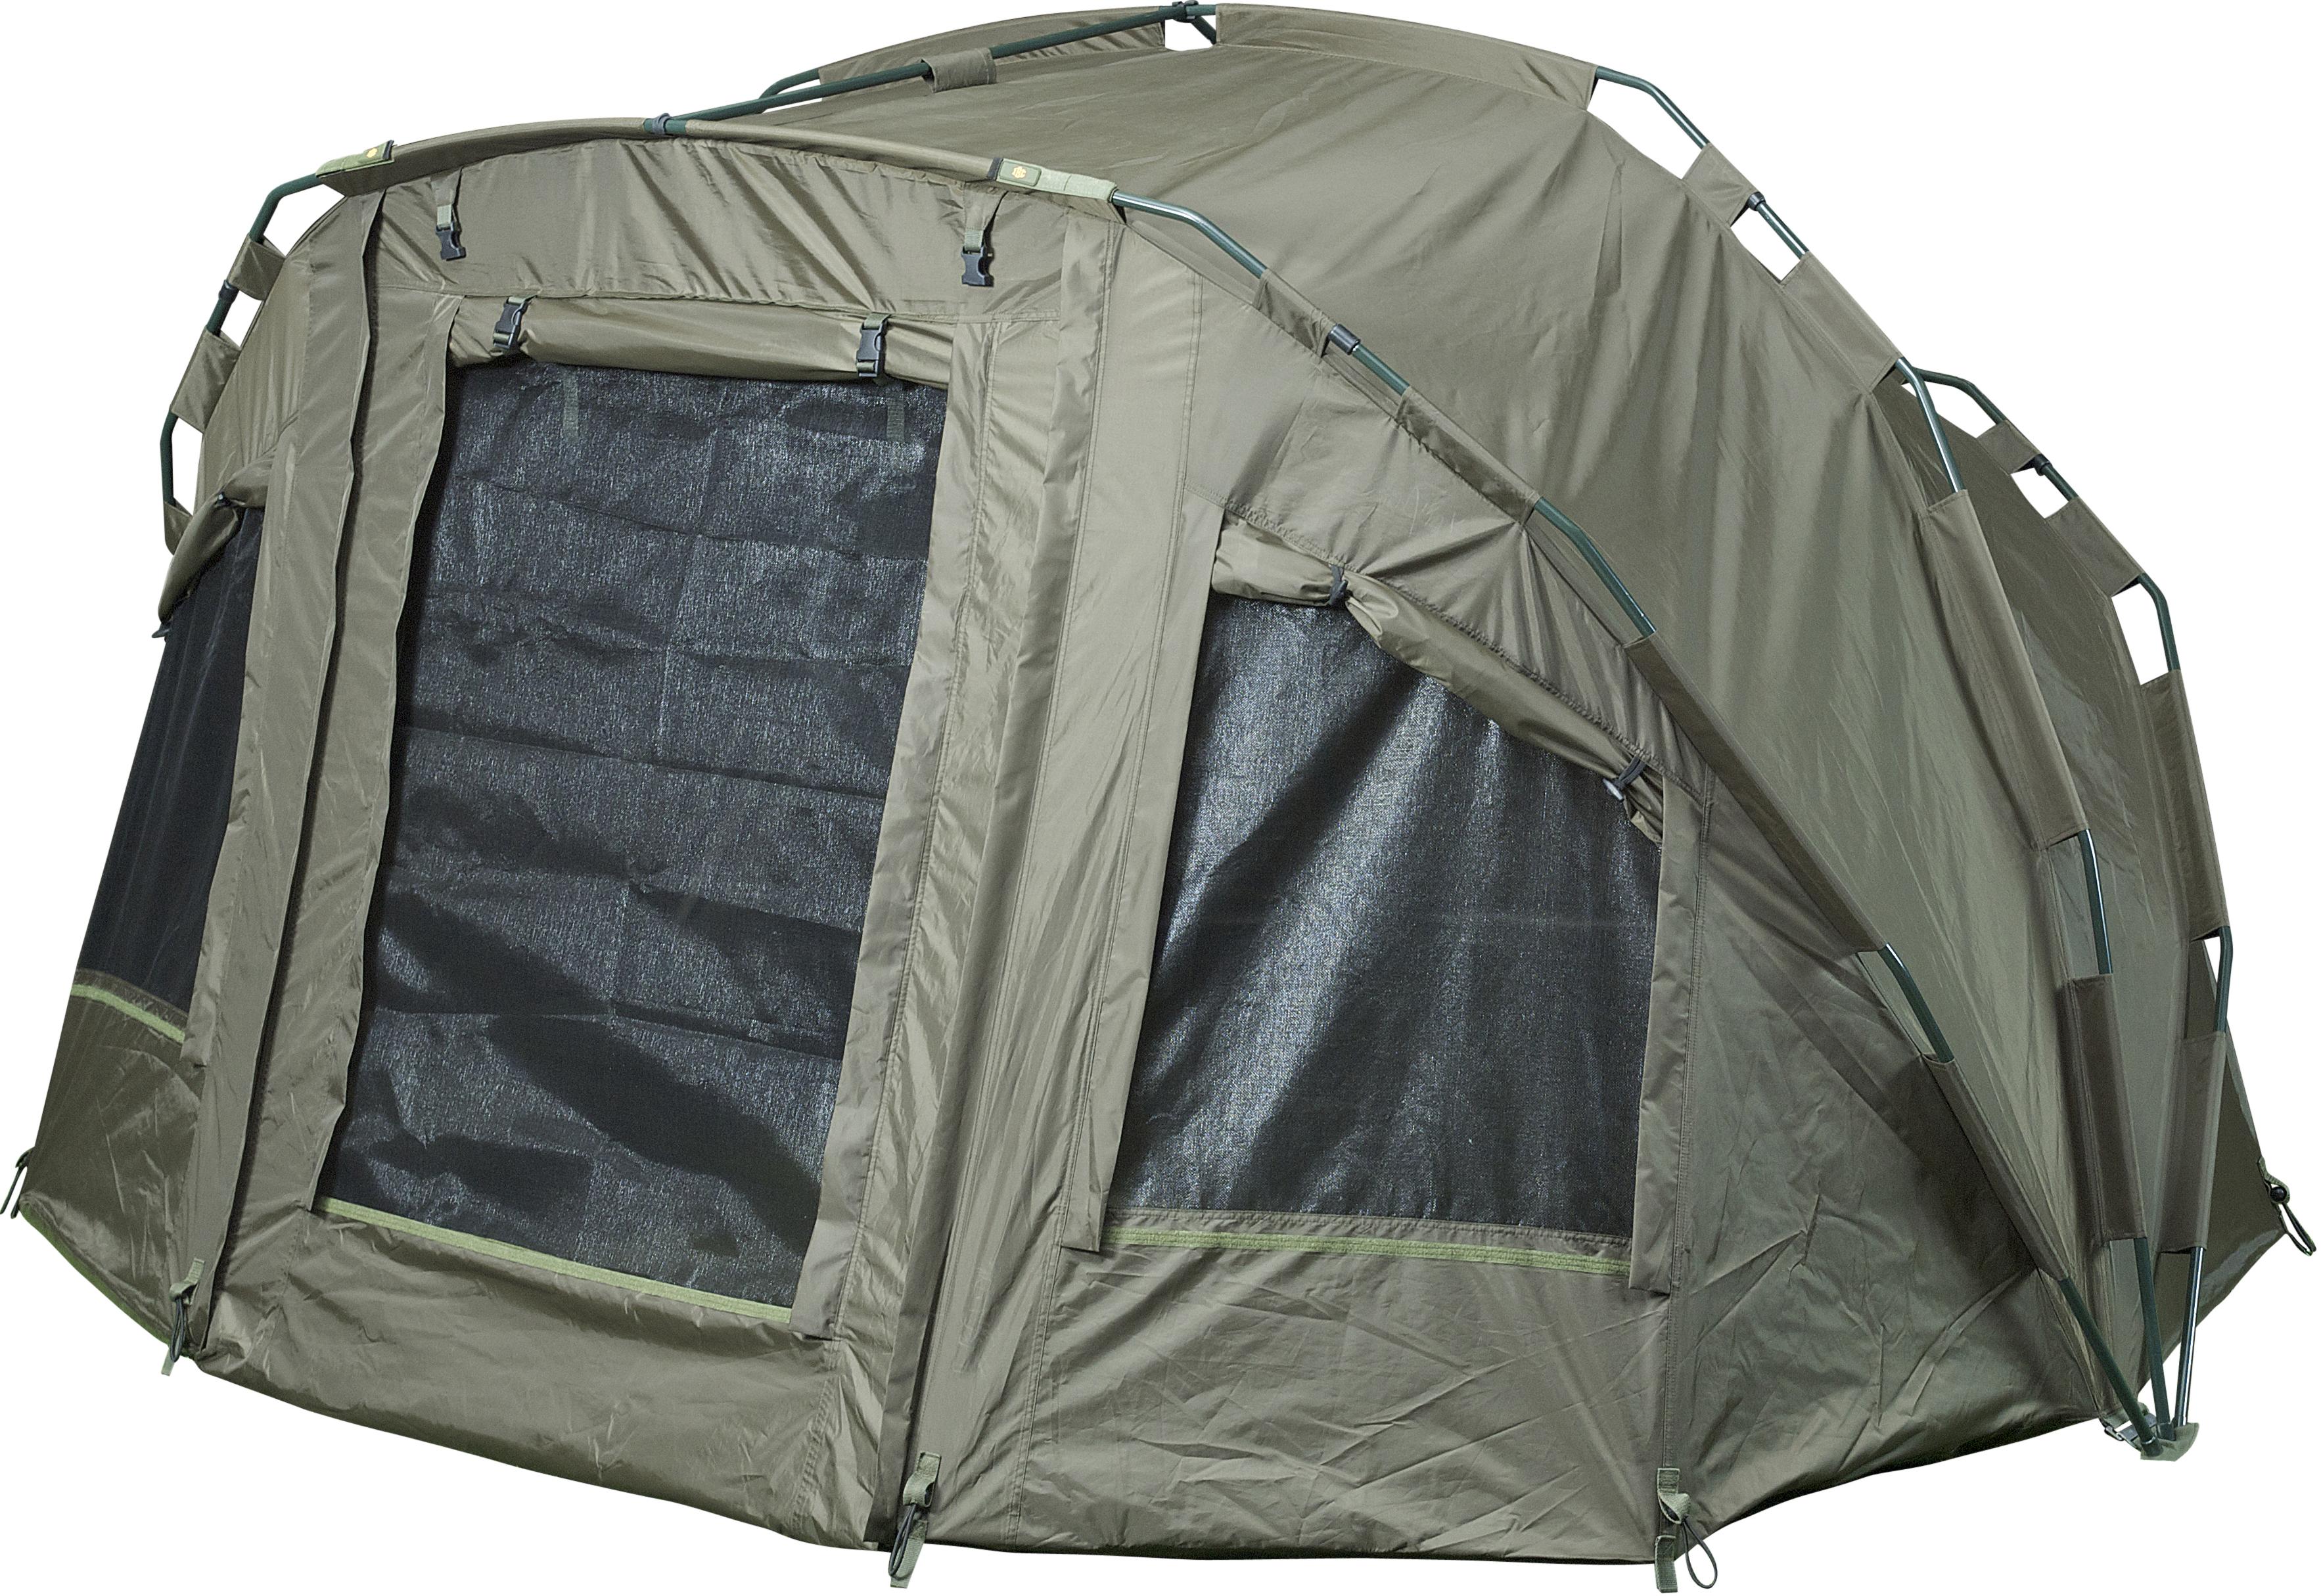 Aventura 4 man single skin tent